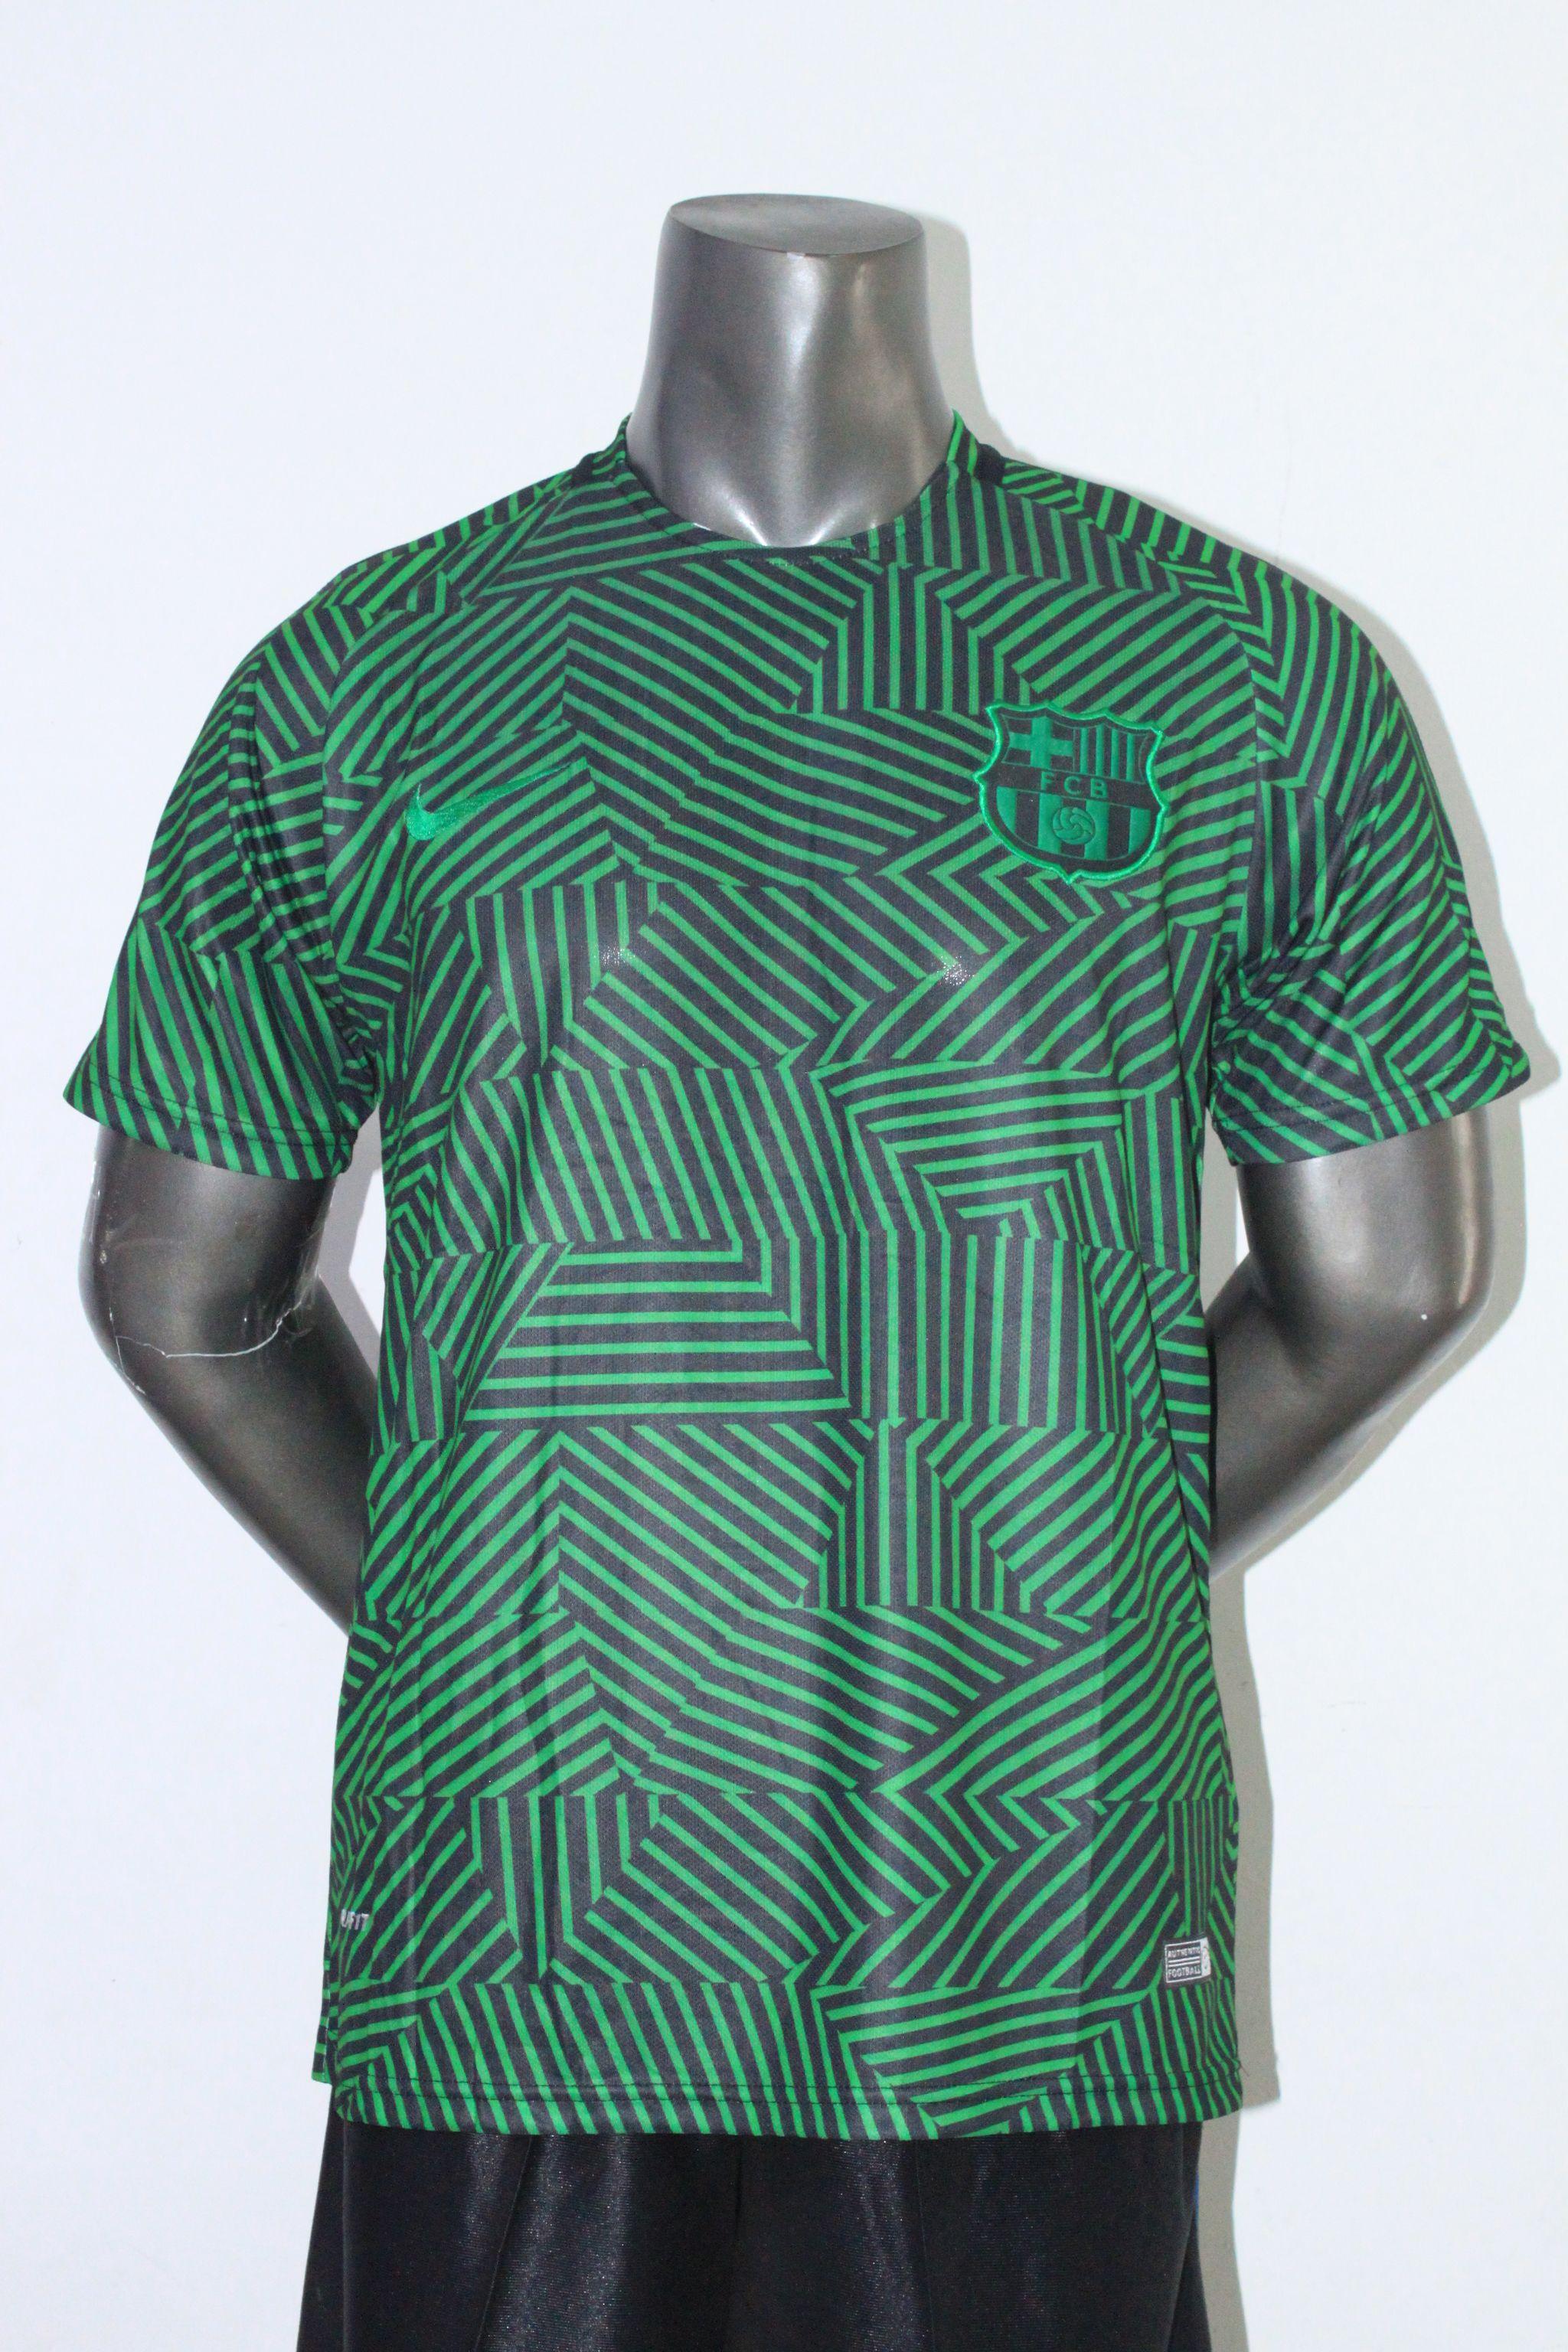 Baju Kiper Nike